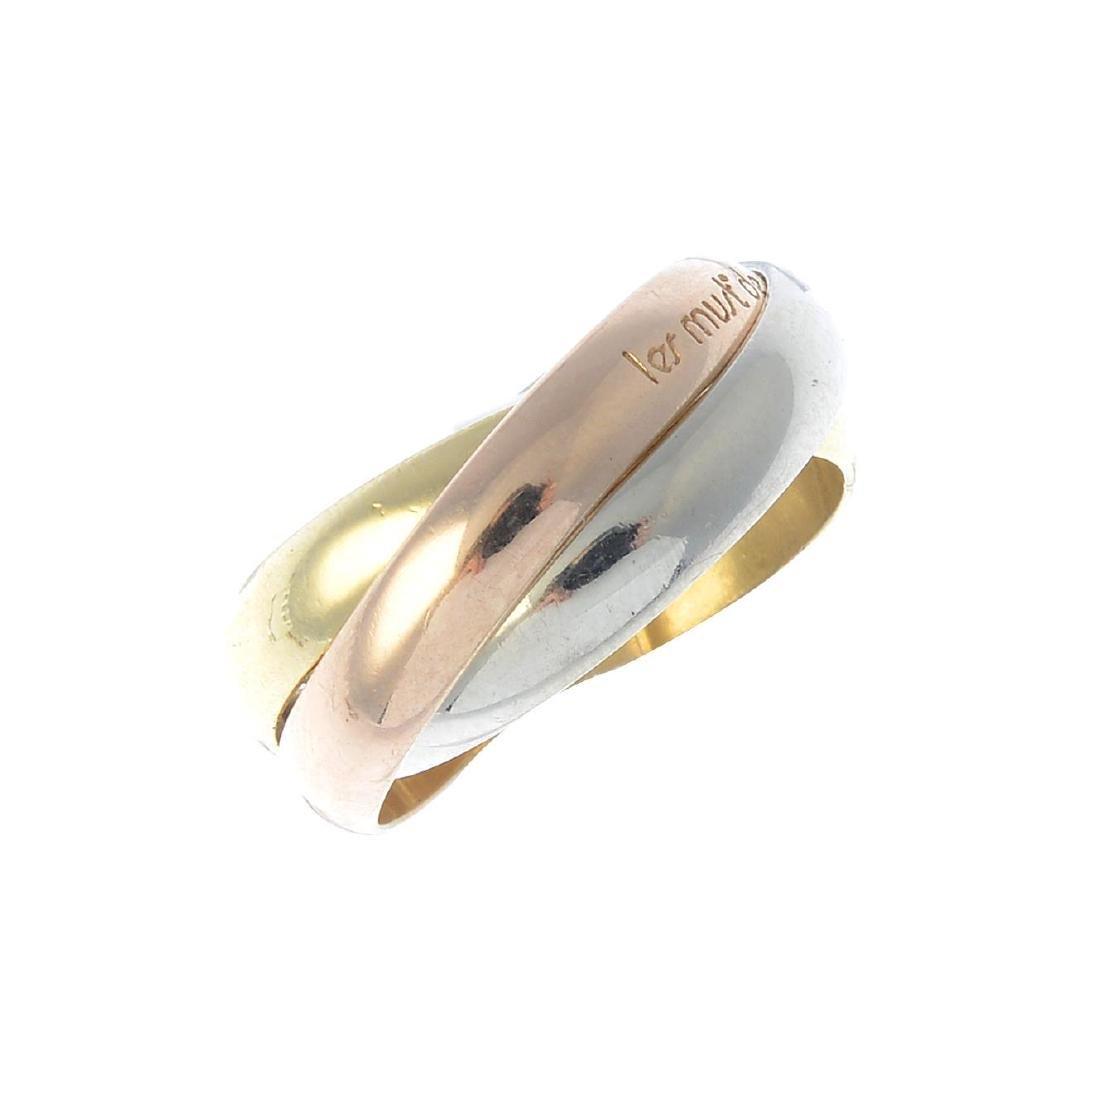 CARTIER - a 'Trinity' ring. Of tri-colour design,